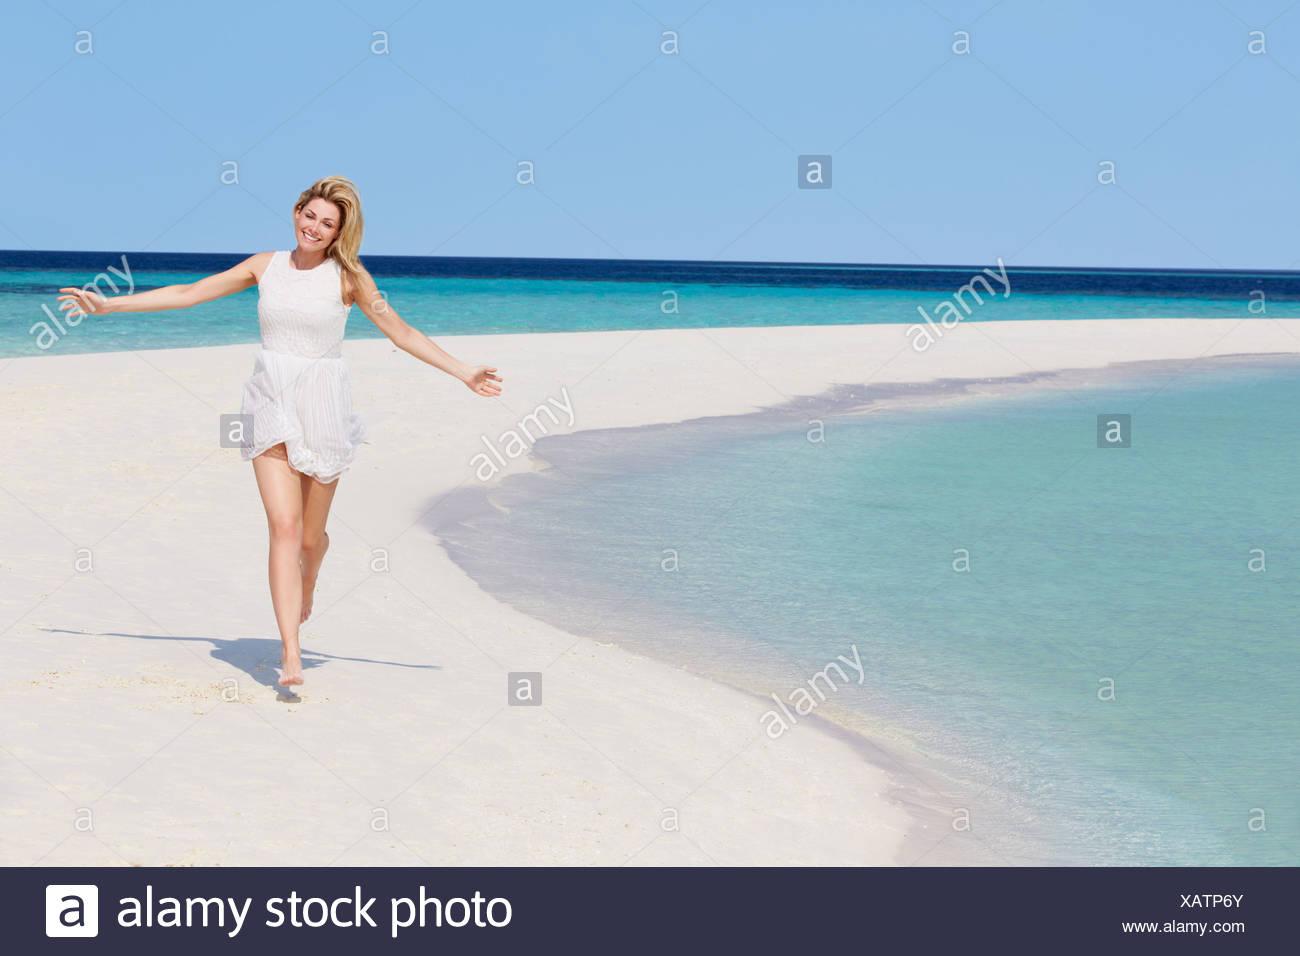 Woman Running On Beautiful Tropical Beach - Stock Image